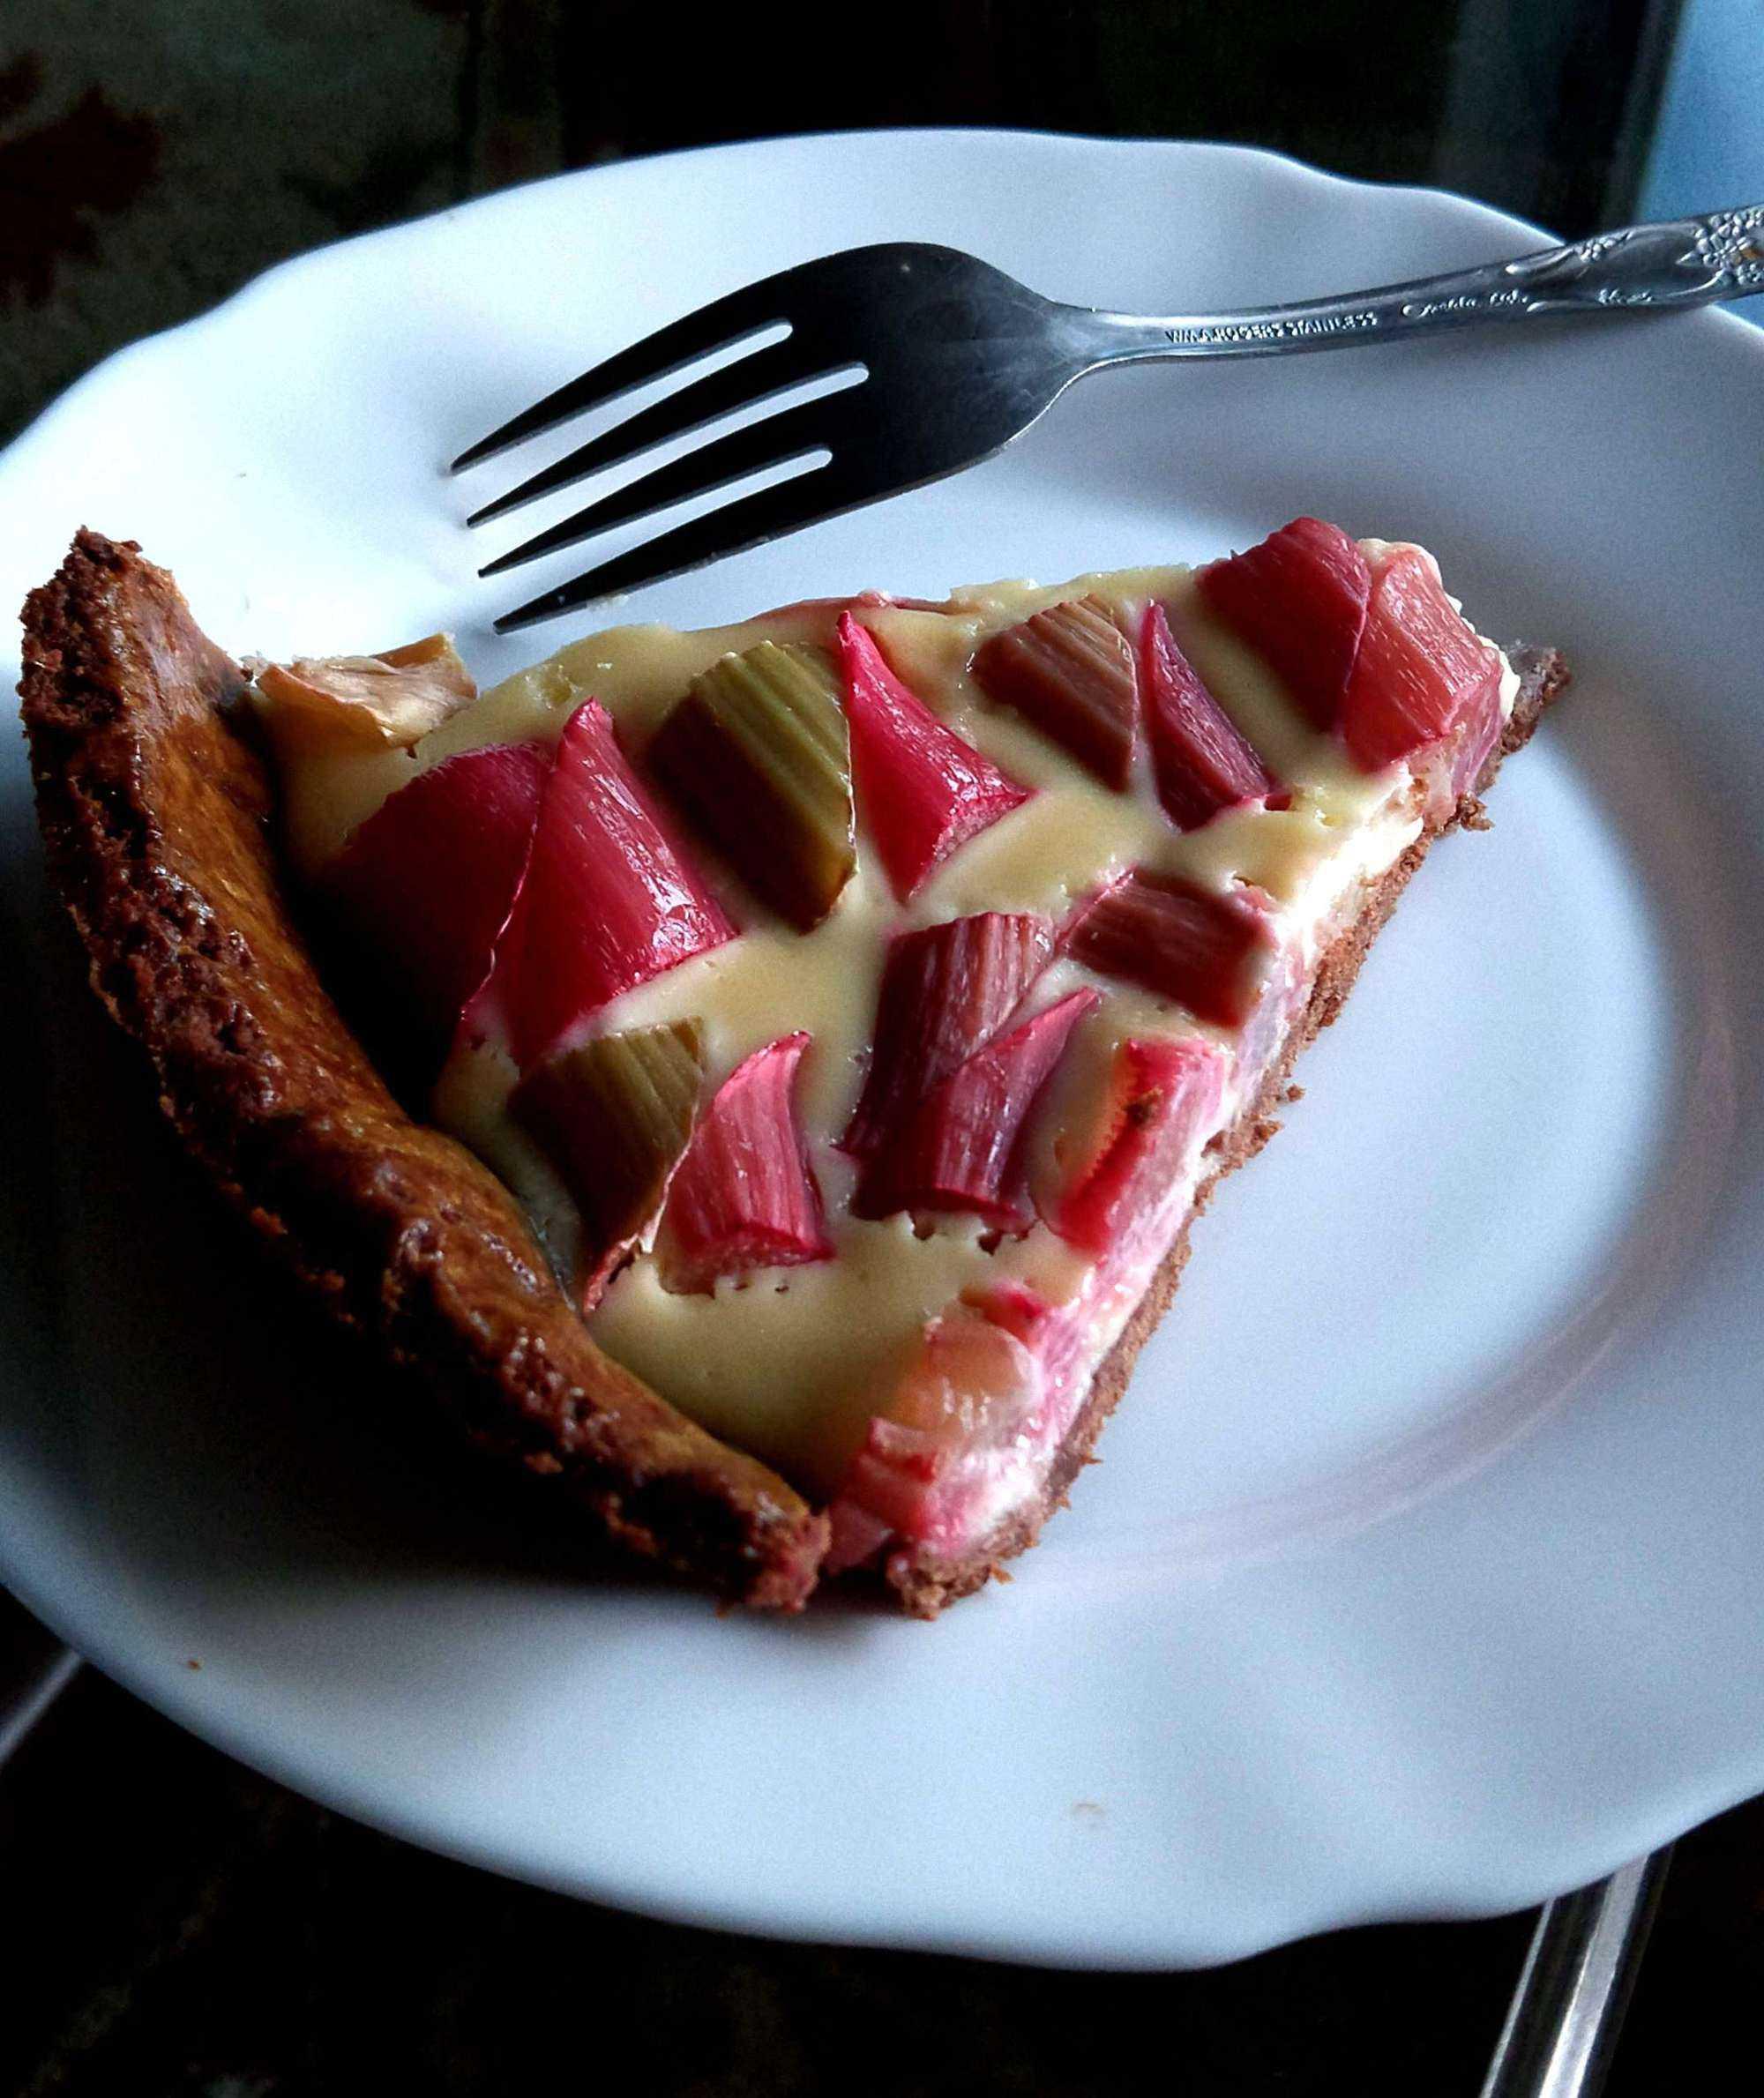 Rye Chocolate Tart with Rhubarb and Honey